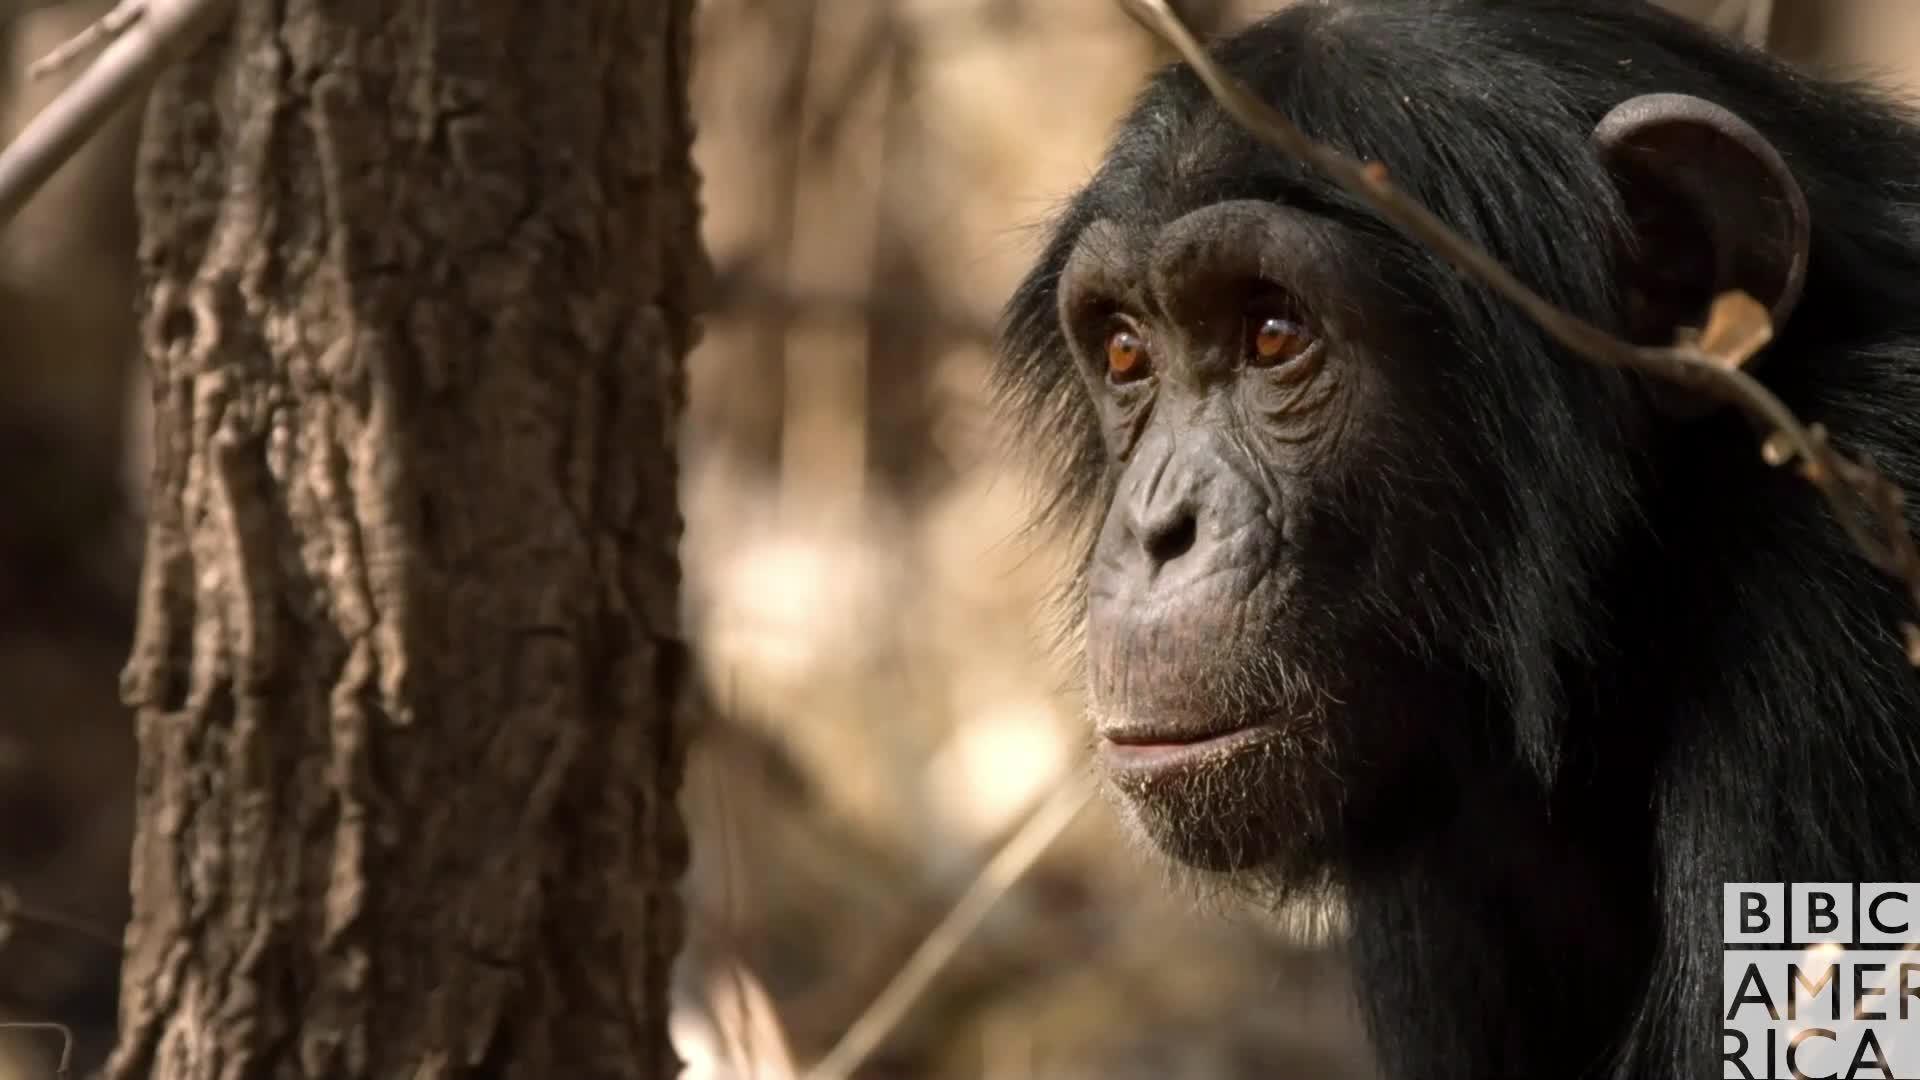 animal, animals, bbc america, bbc america dynasties, bbc america: dynasties, chimp, chimpanzee, chimpanzees, chimps, dynasties, Dynasties Chimp Scared GIFs